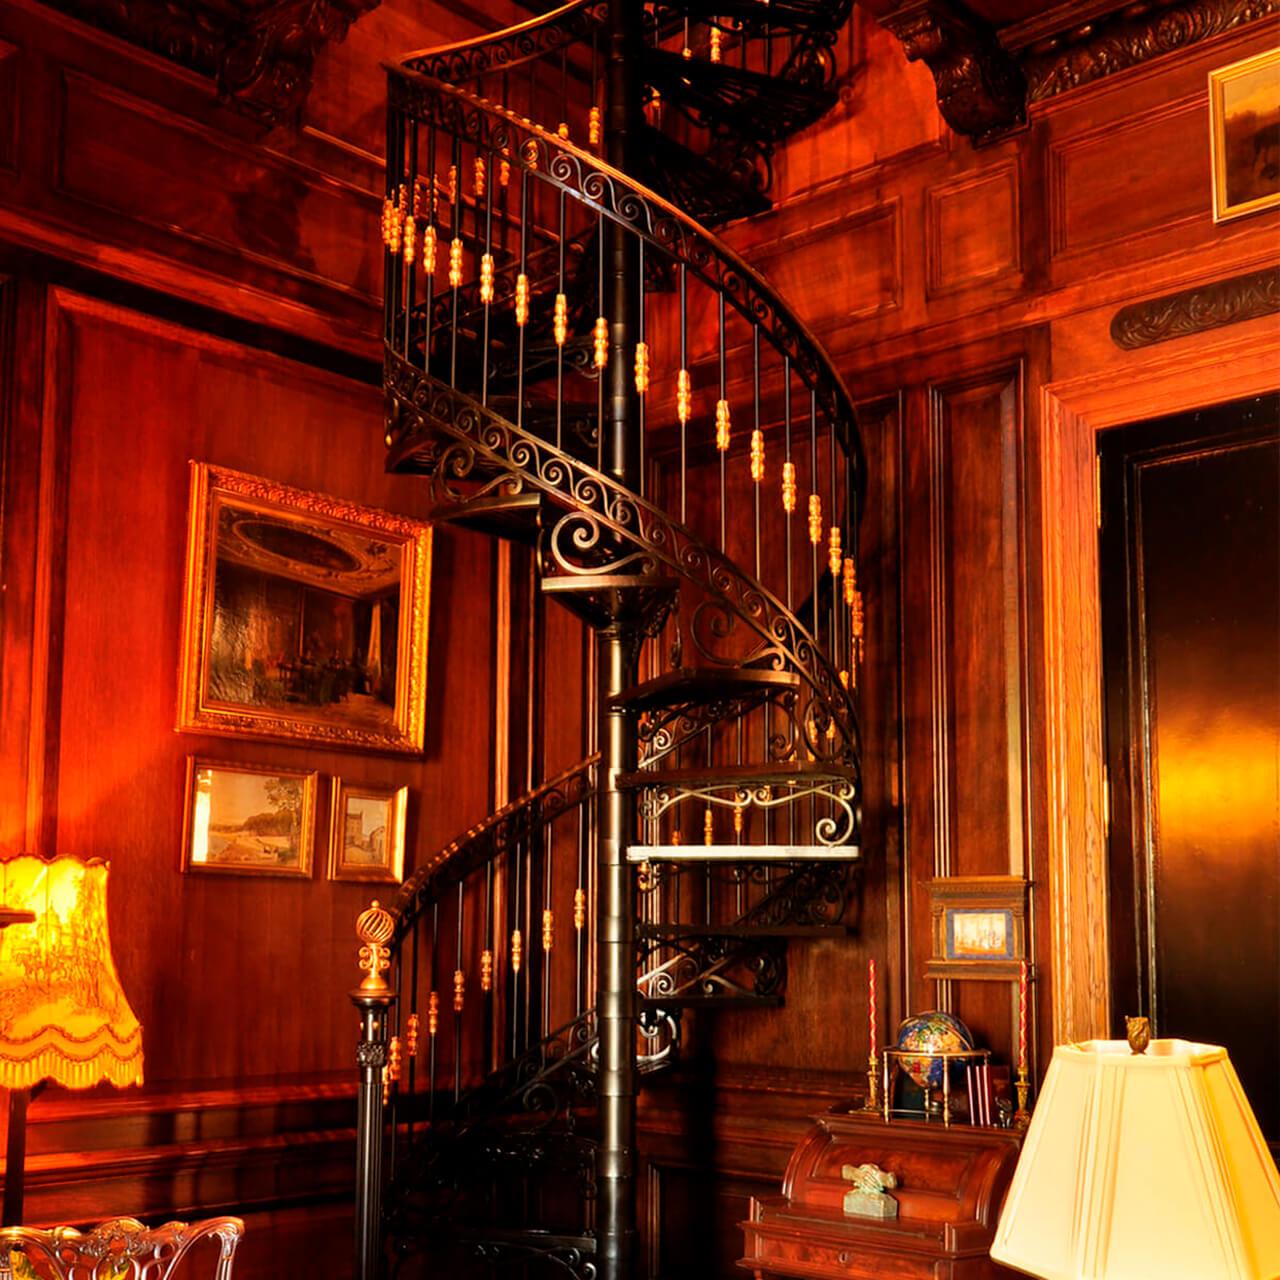 The Spiral Stair Attraction Belt